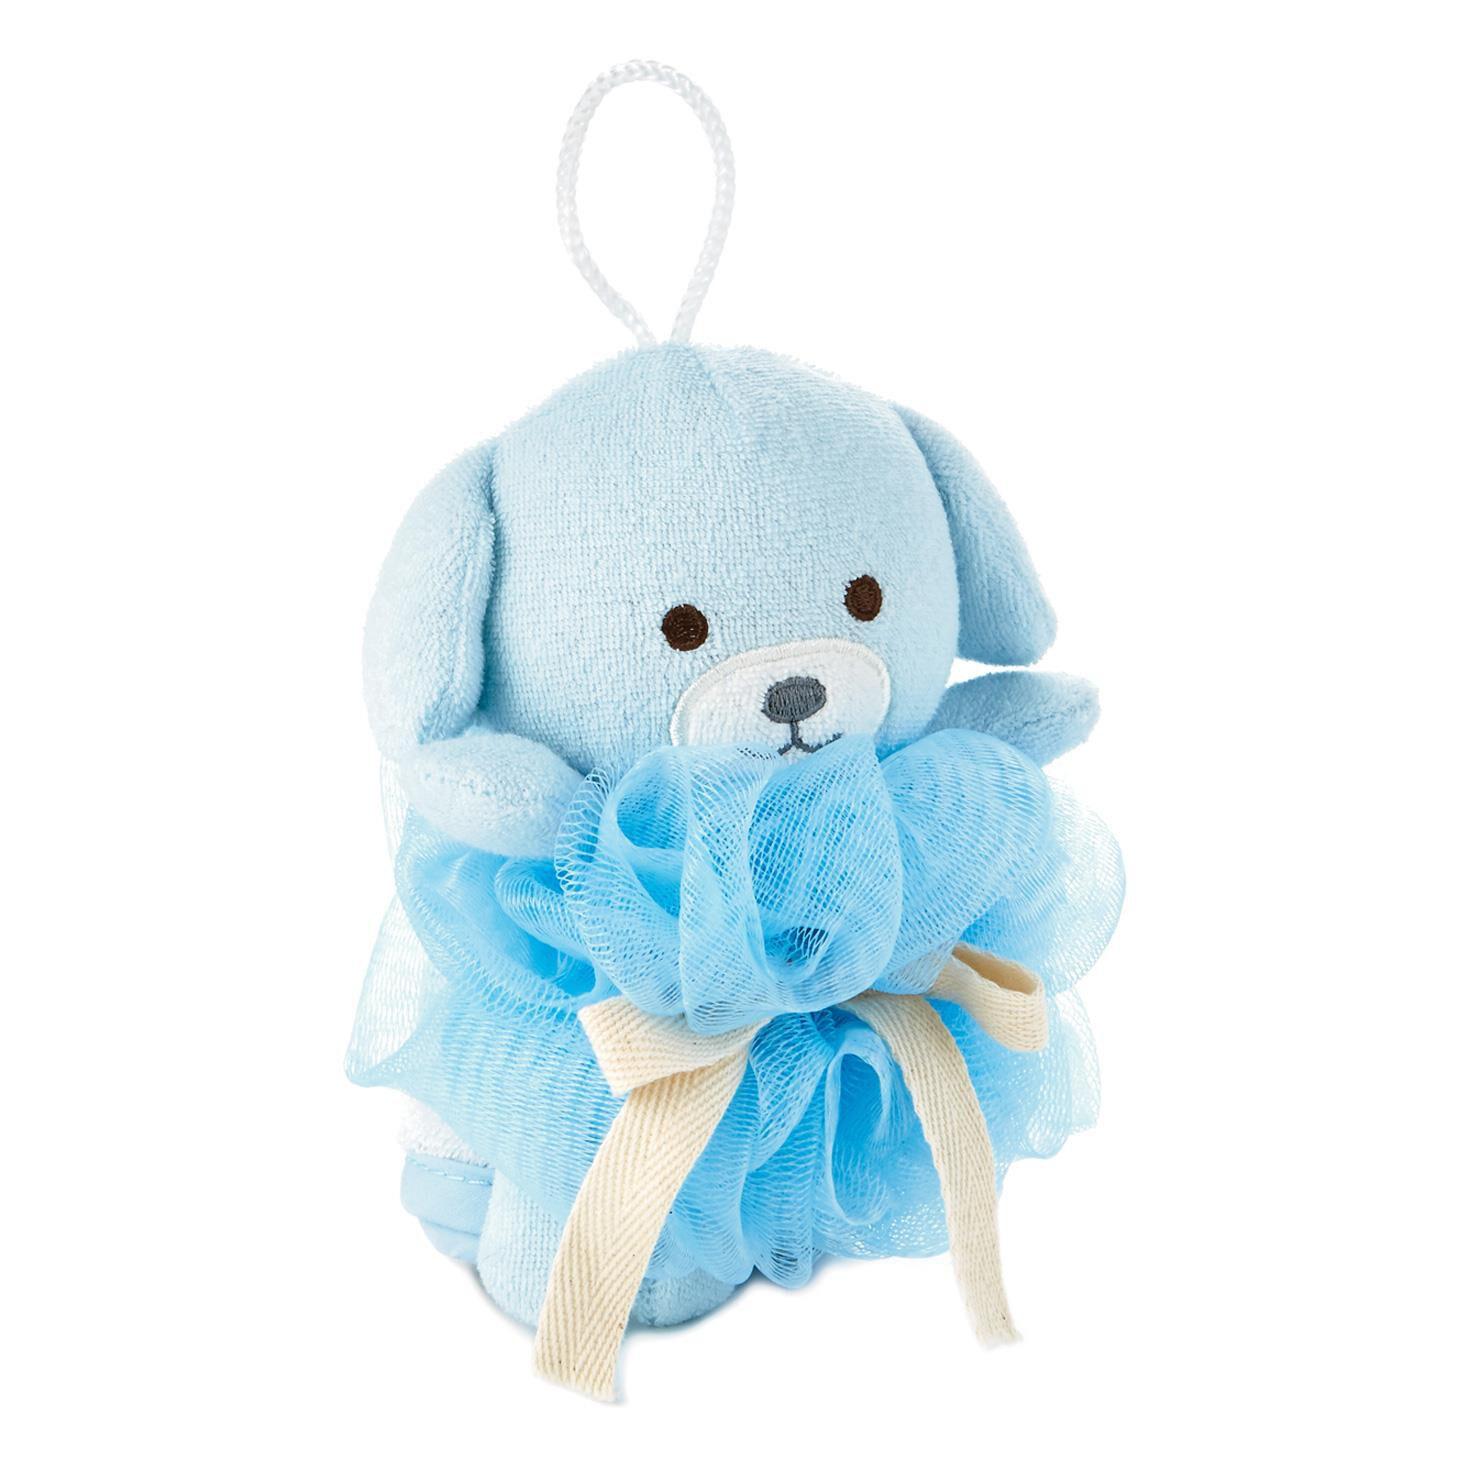 Puppy Loofah and Washcloth Baby Bath Set - Baby Essentials - Hallmark